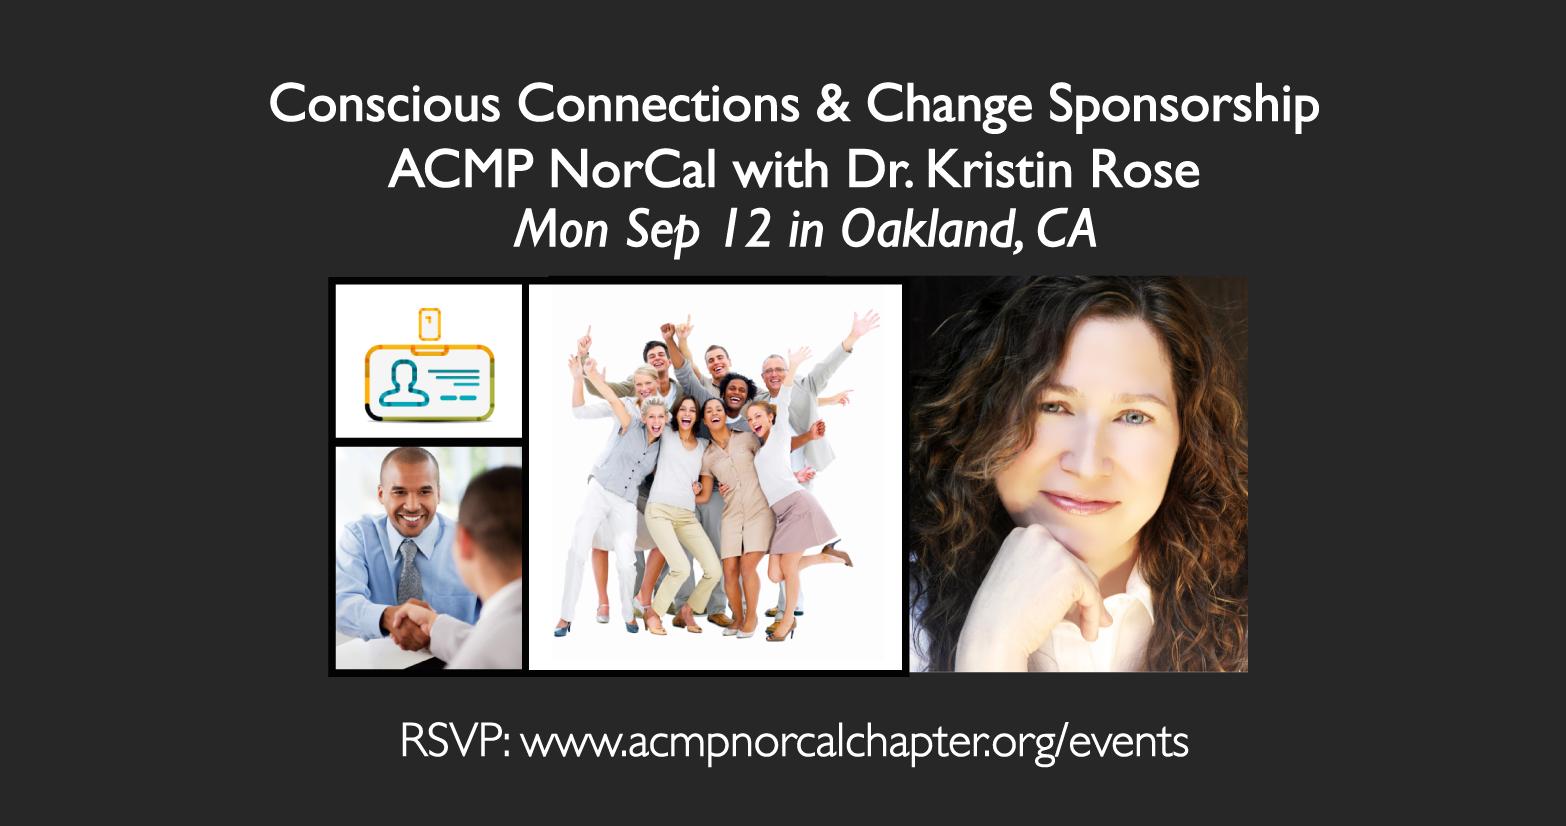 Change Leadership - ACMP NorCal Event - Dr. Kristin Rose